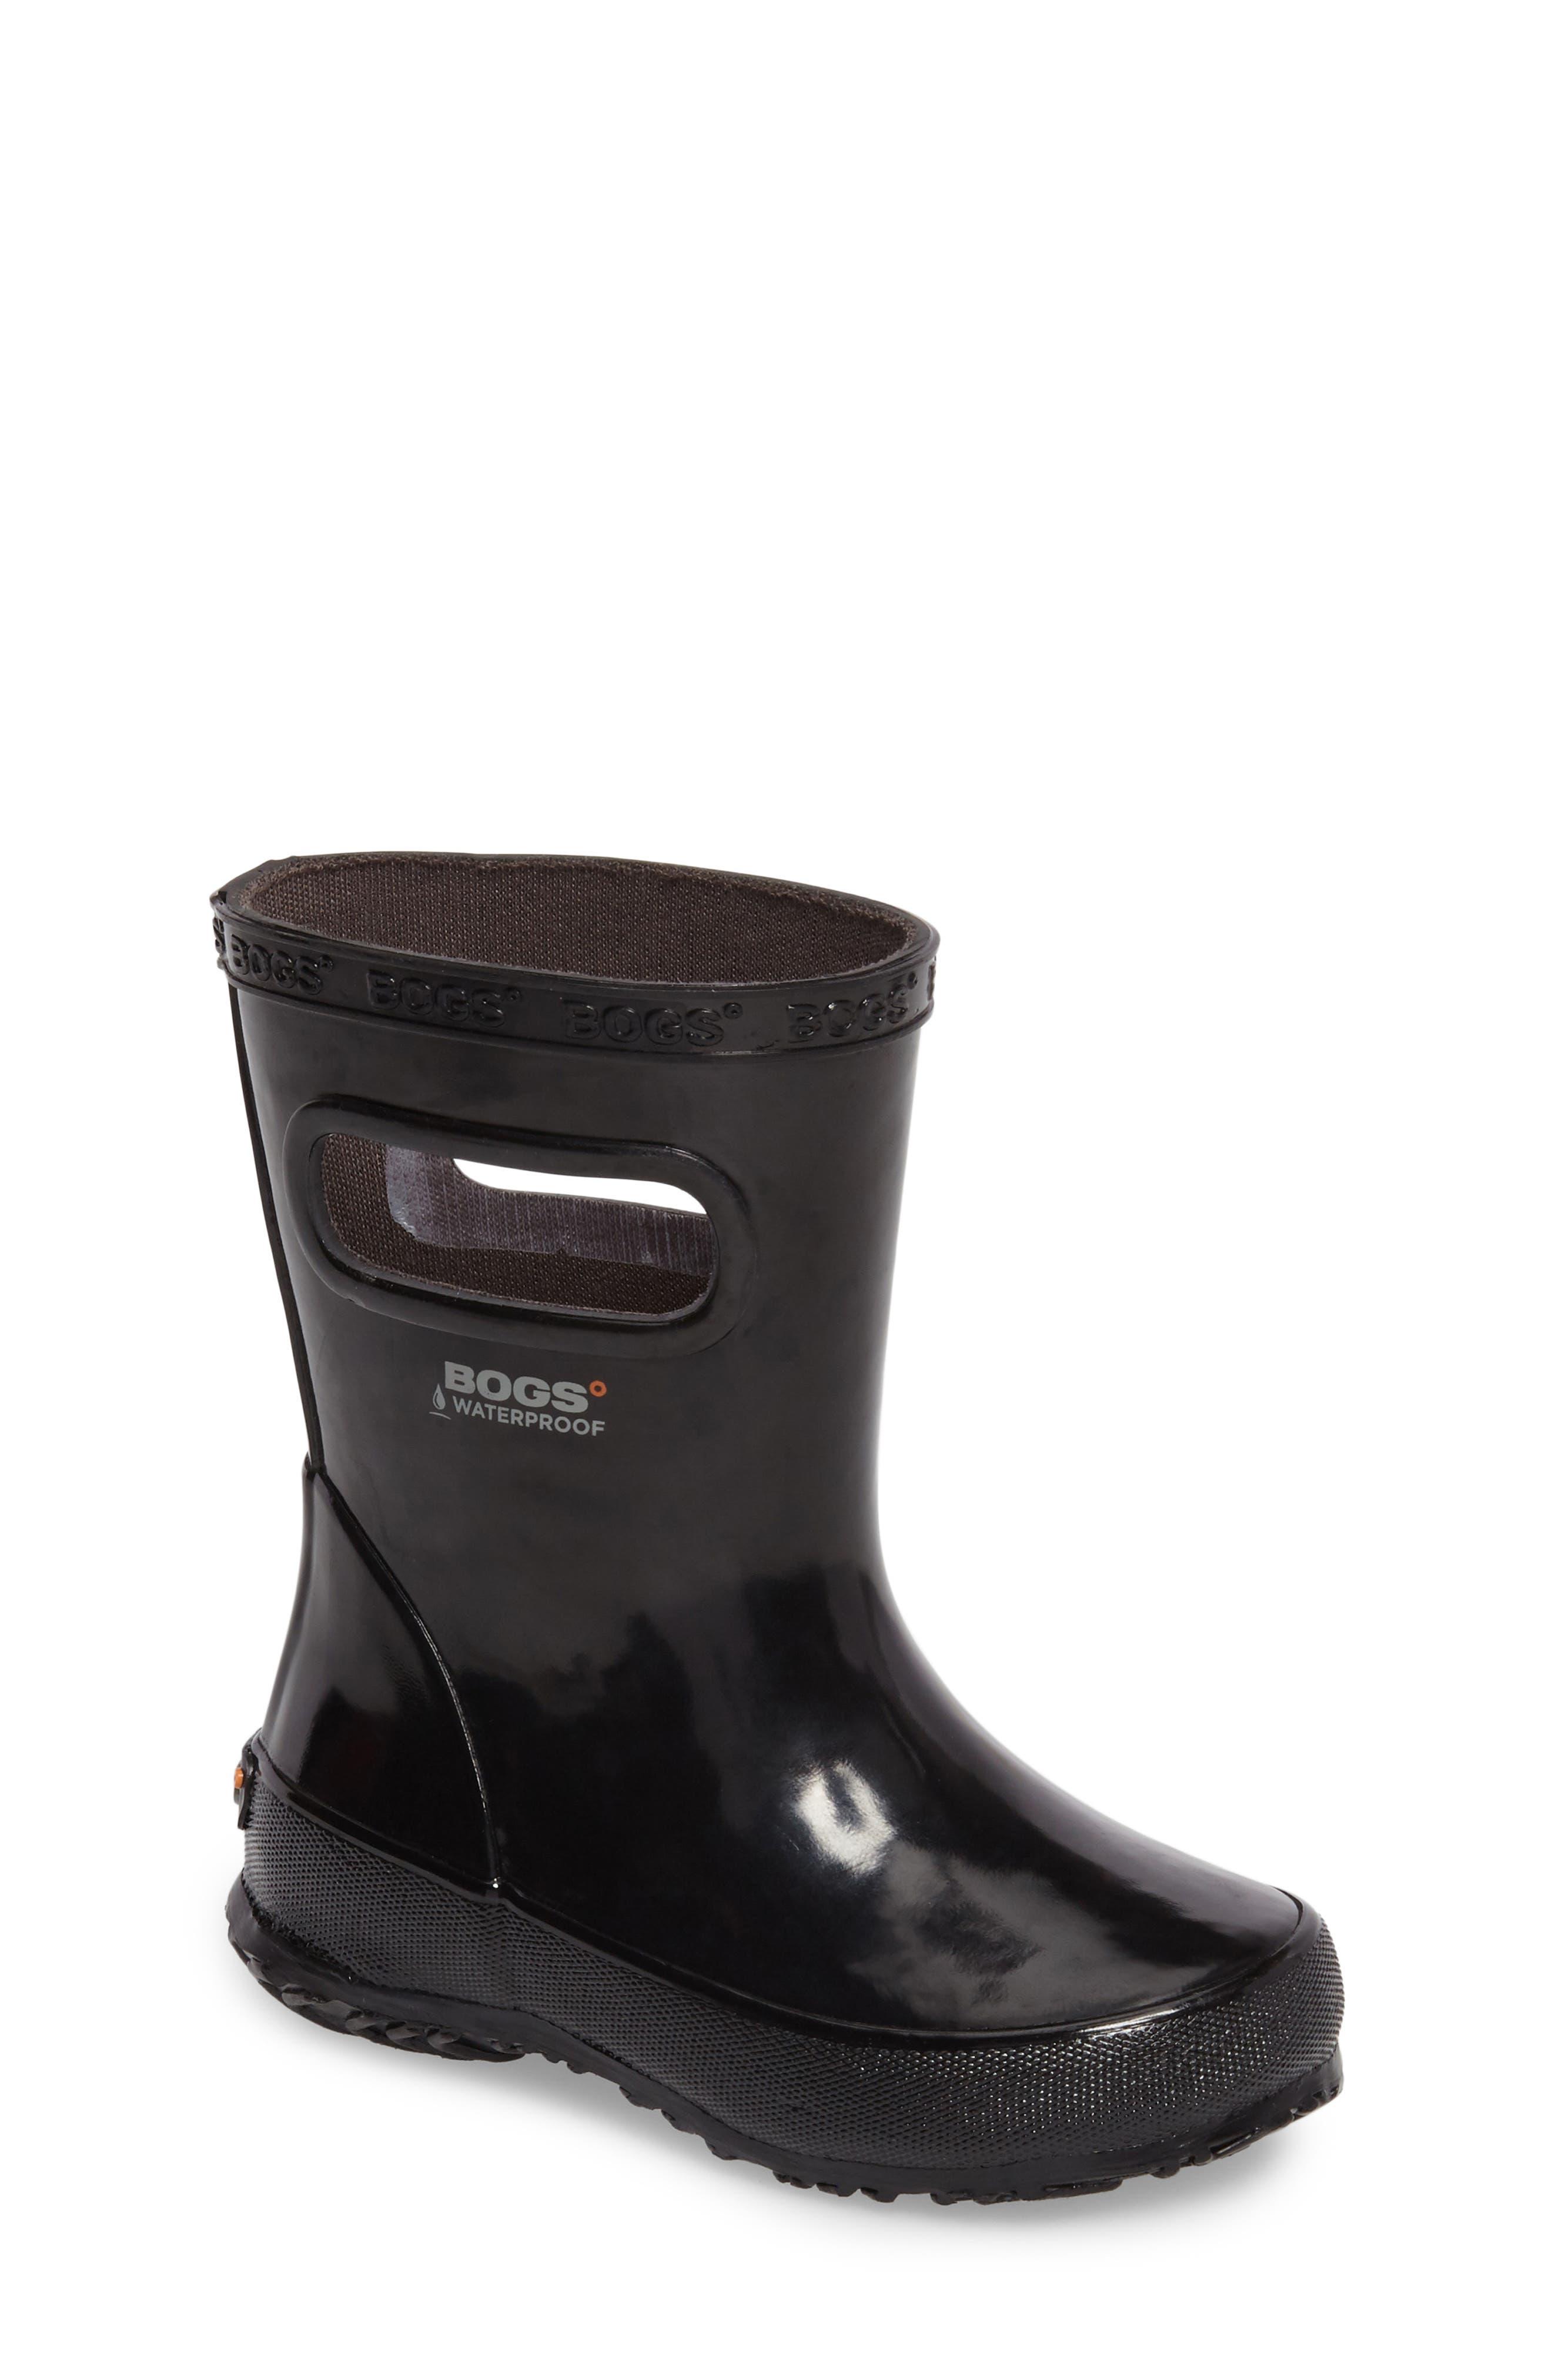 Skipper Rubber Rain Boot,                             Main thumbnail 1, color,                             Black